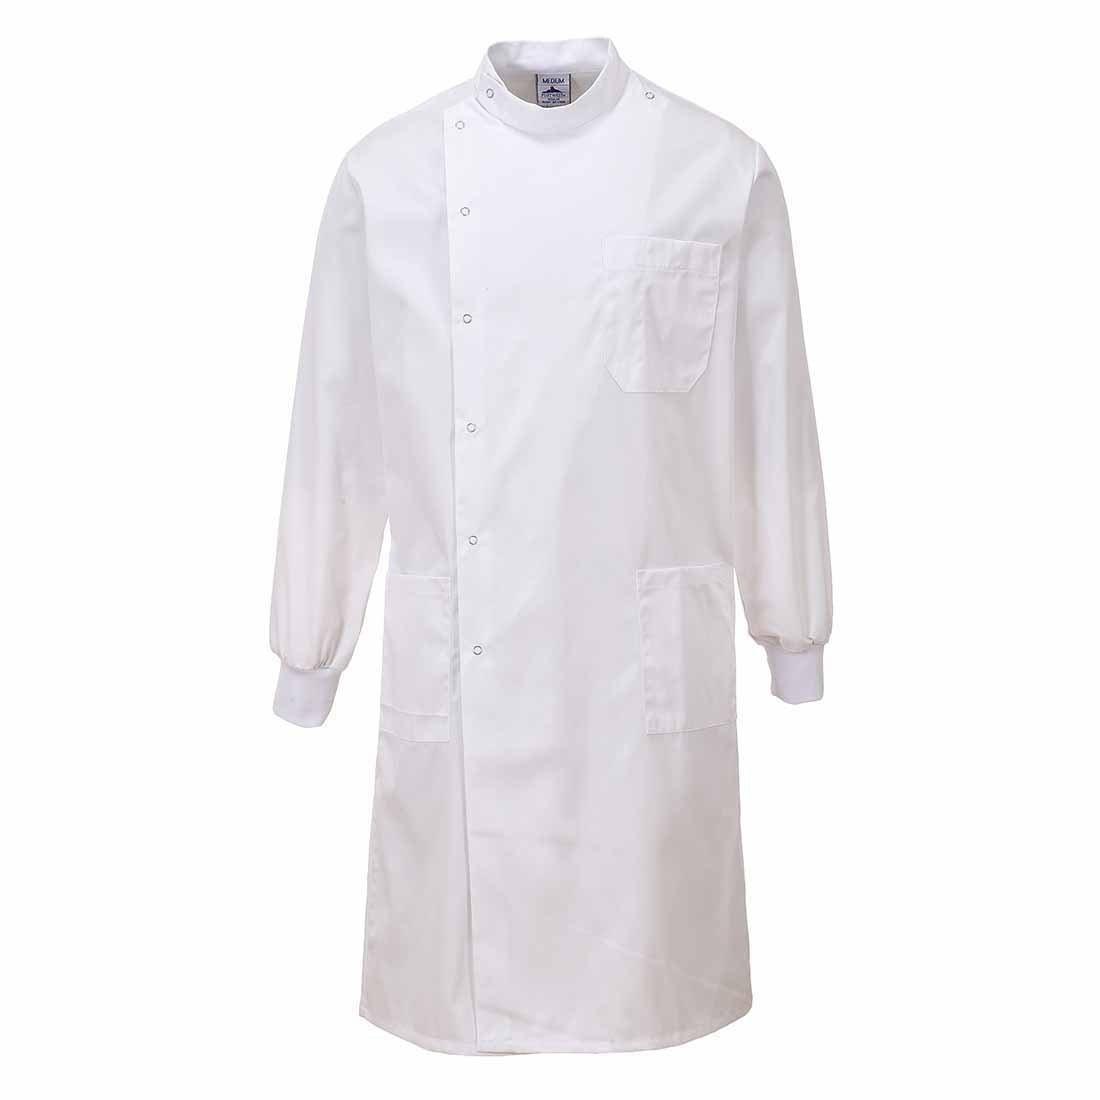 James Unisex Howie Styled Lab Coat White Dr